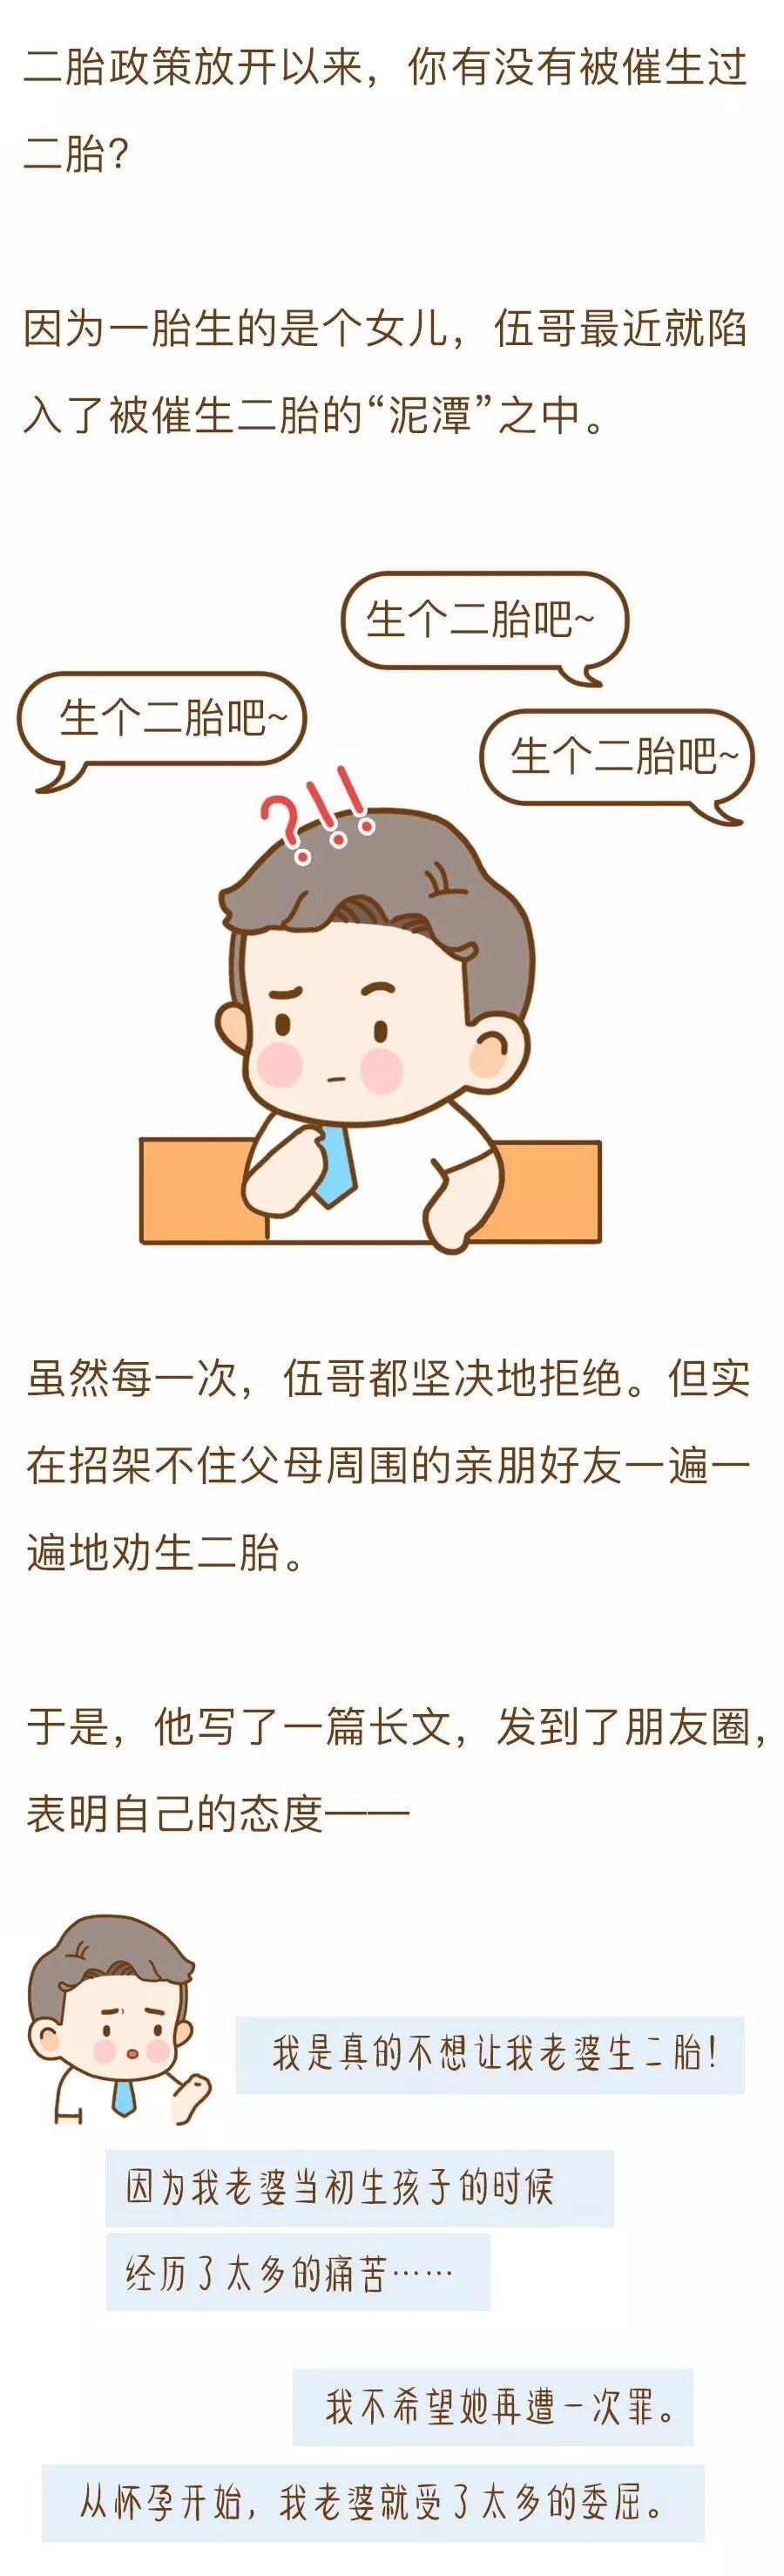 wellbet官方网站登录 1